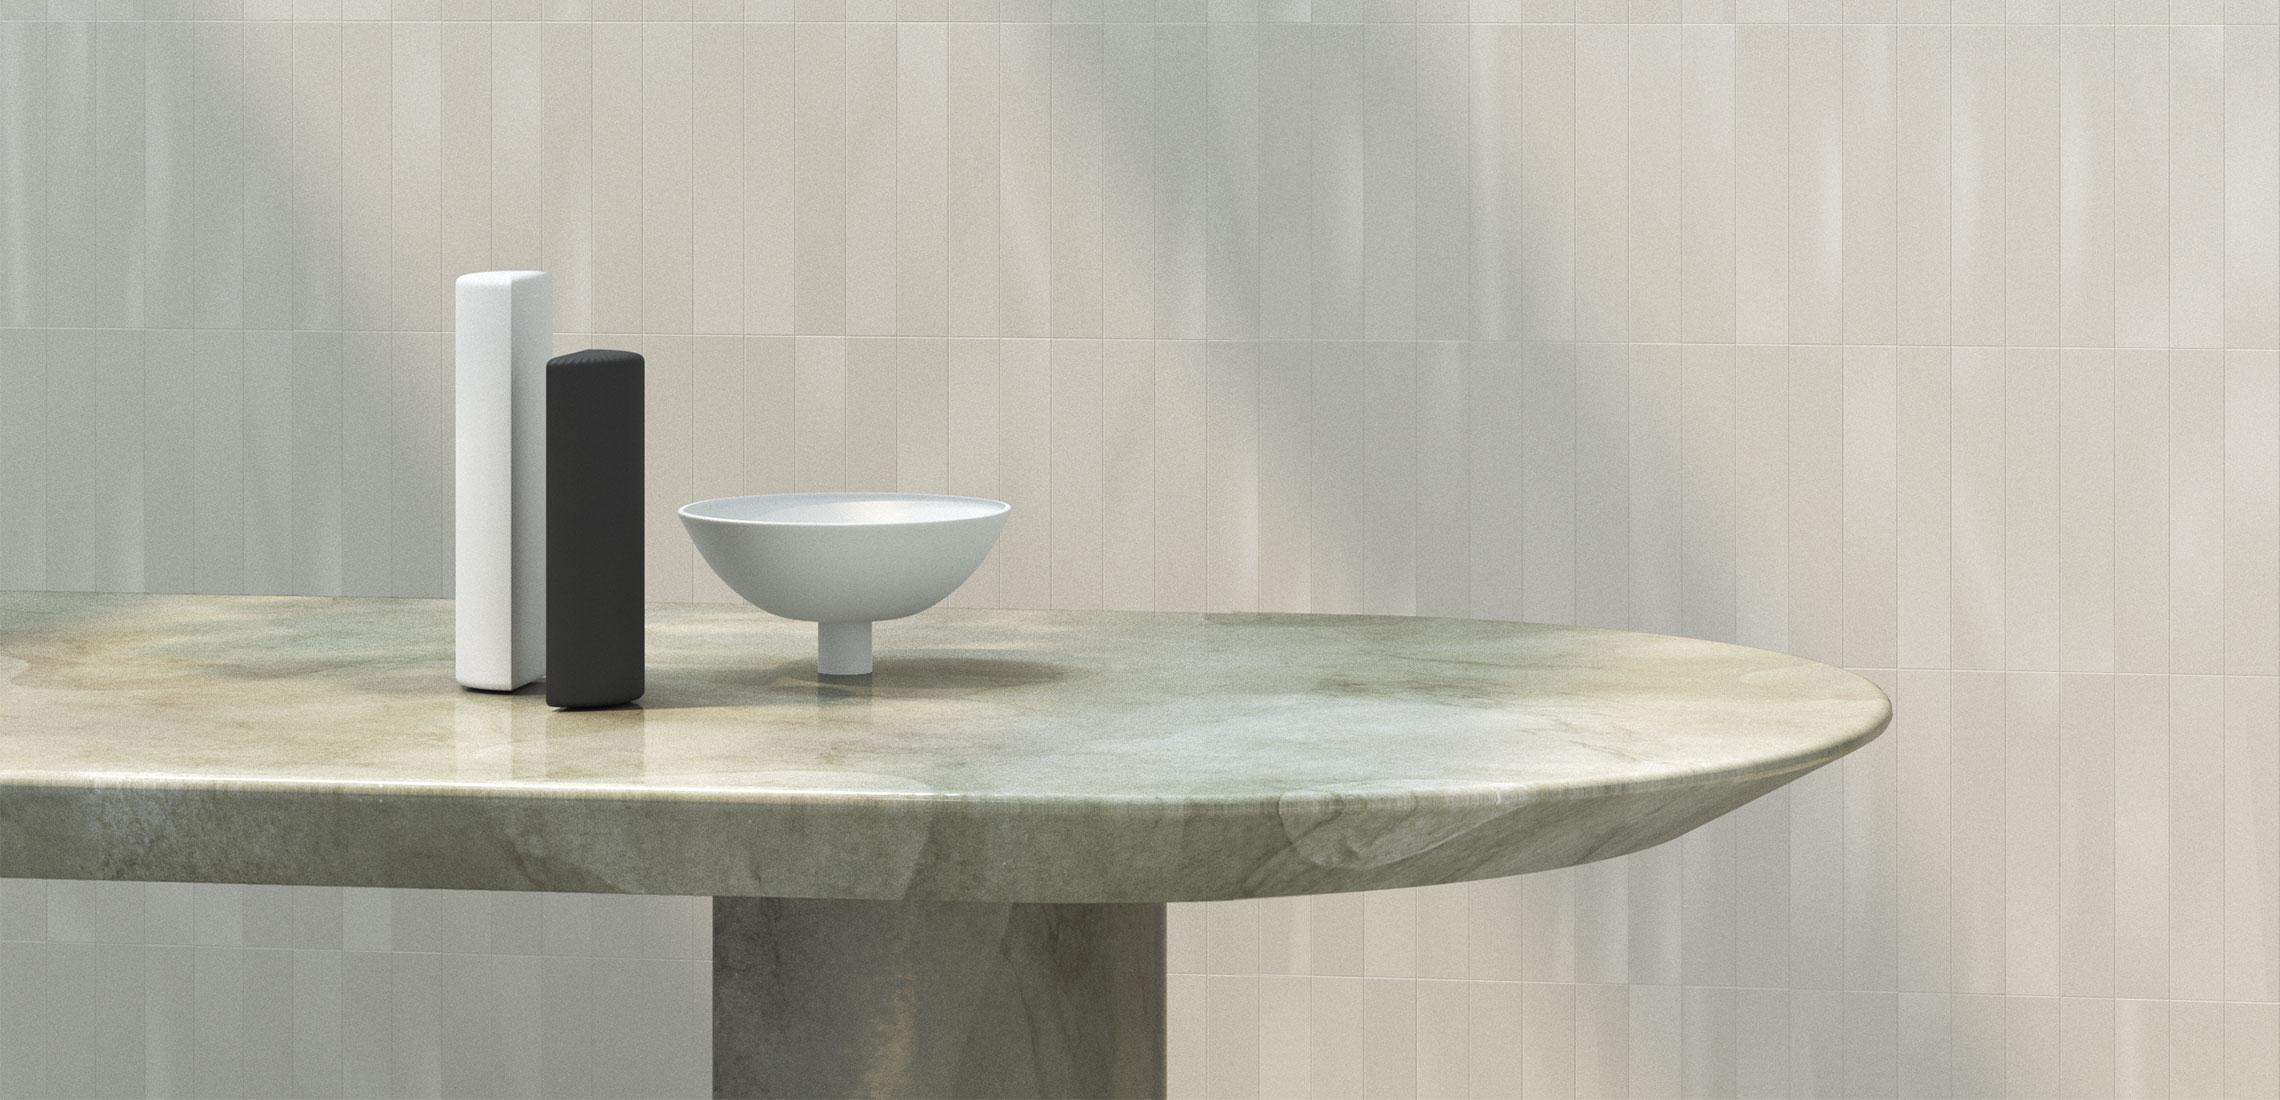 amb-livingceramics-Balance-Moonwhite-5x30-hr-03_banner